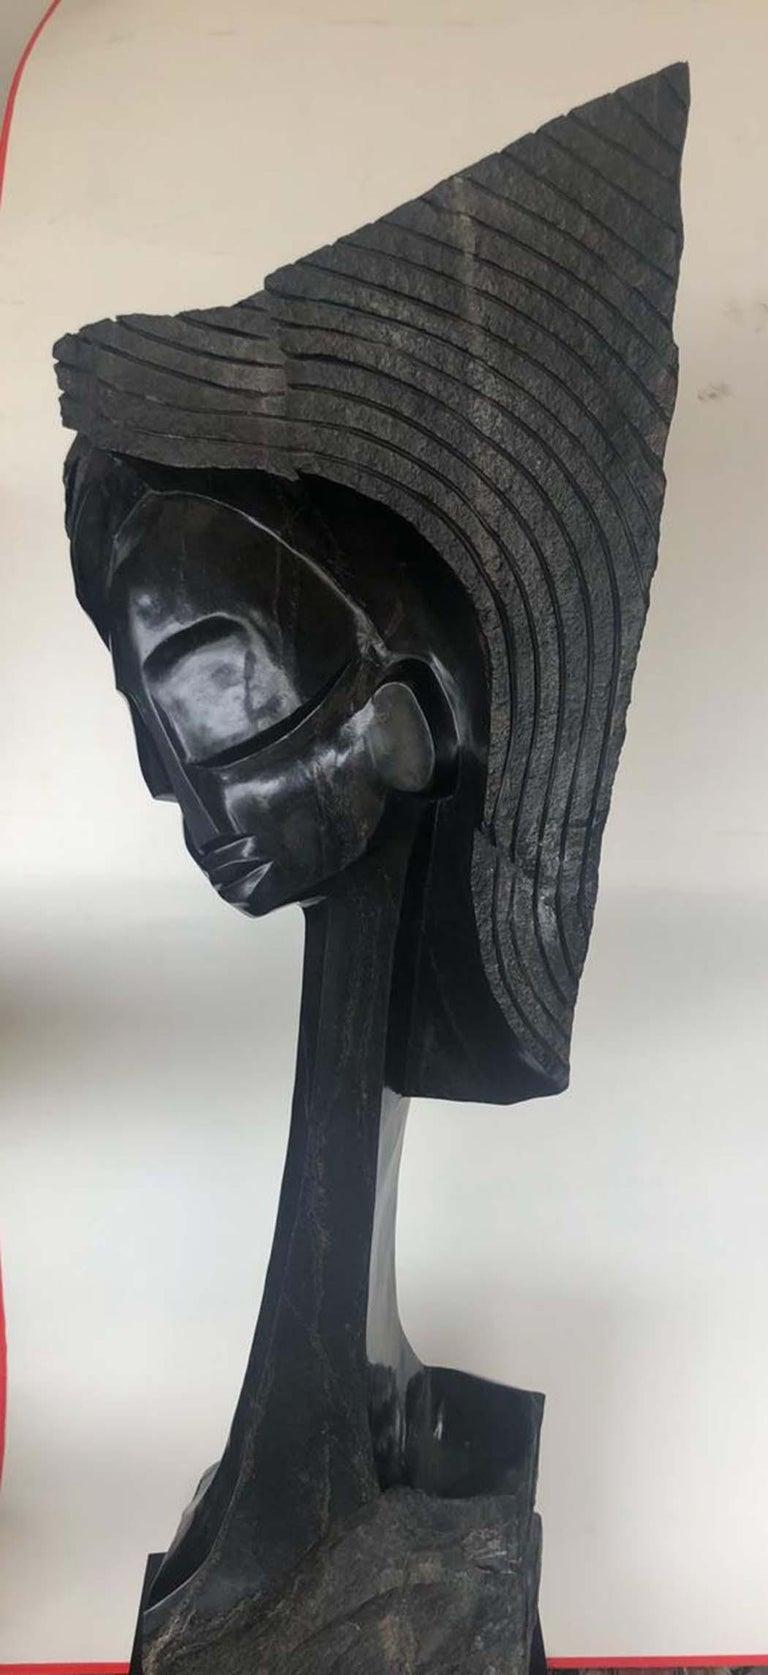 The Model, Shona - Sculpture by Witness Bonjesi